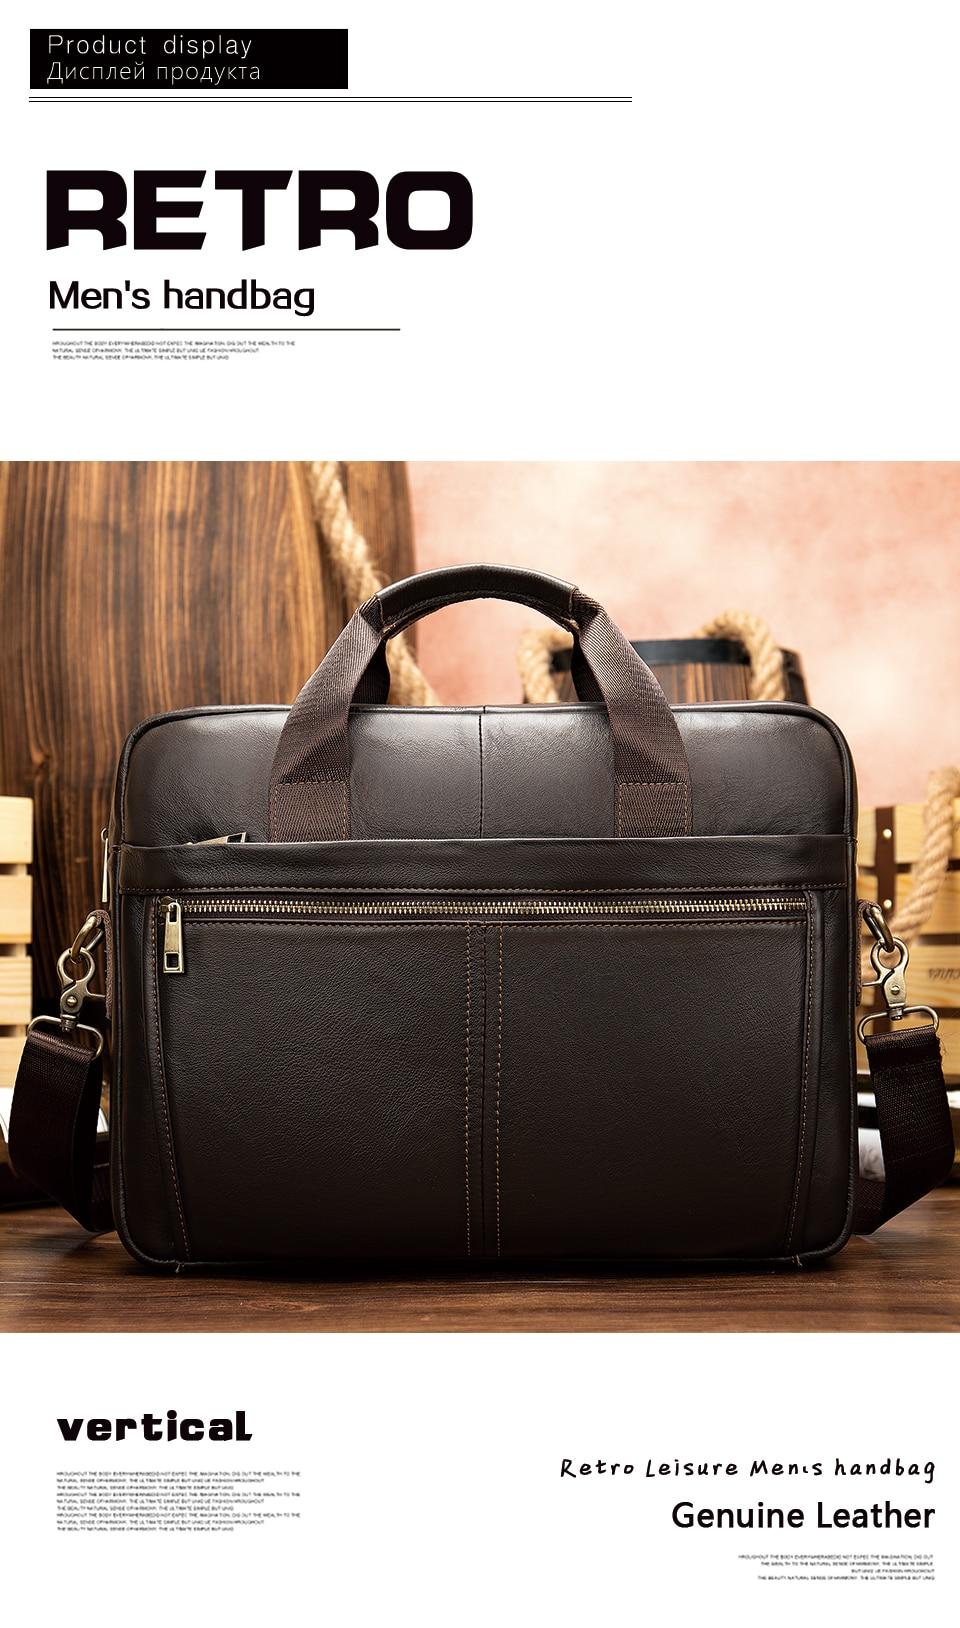 HTB1M4WrUCzqK1RjSZPcq6zTepXaQ WESTAL briefcase messenger bag men's genuine leather 14'' laptop bag men's briefcases office business tote for document 8572